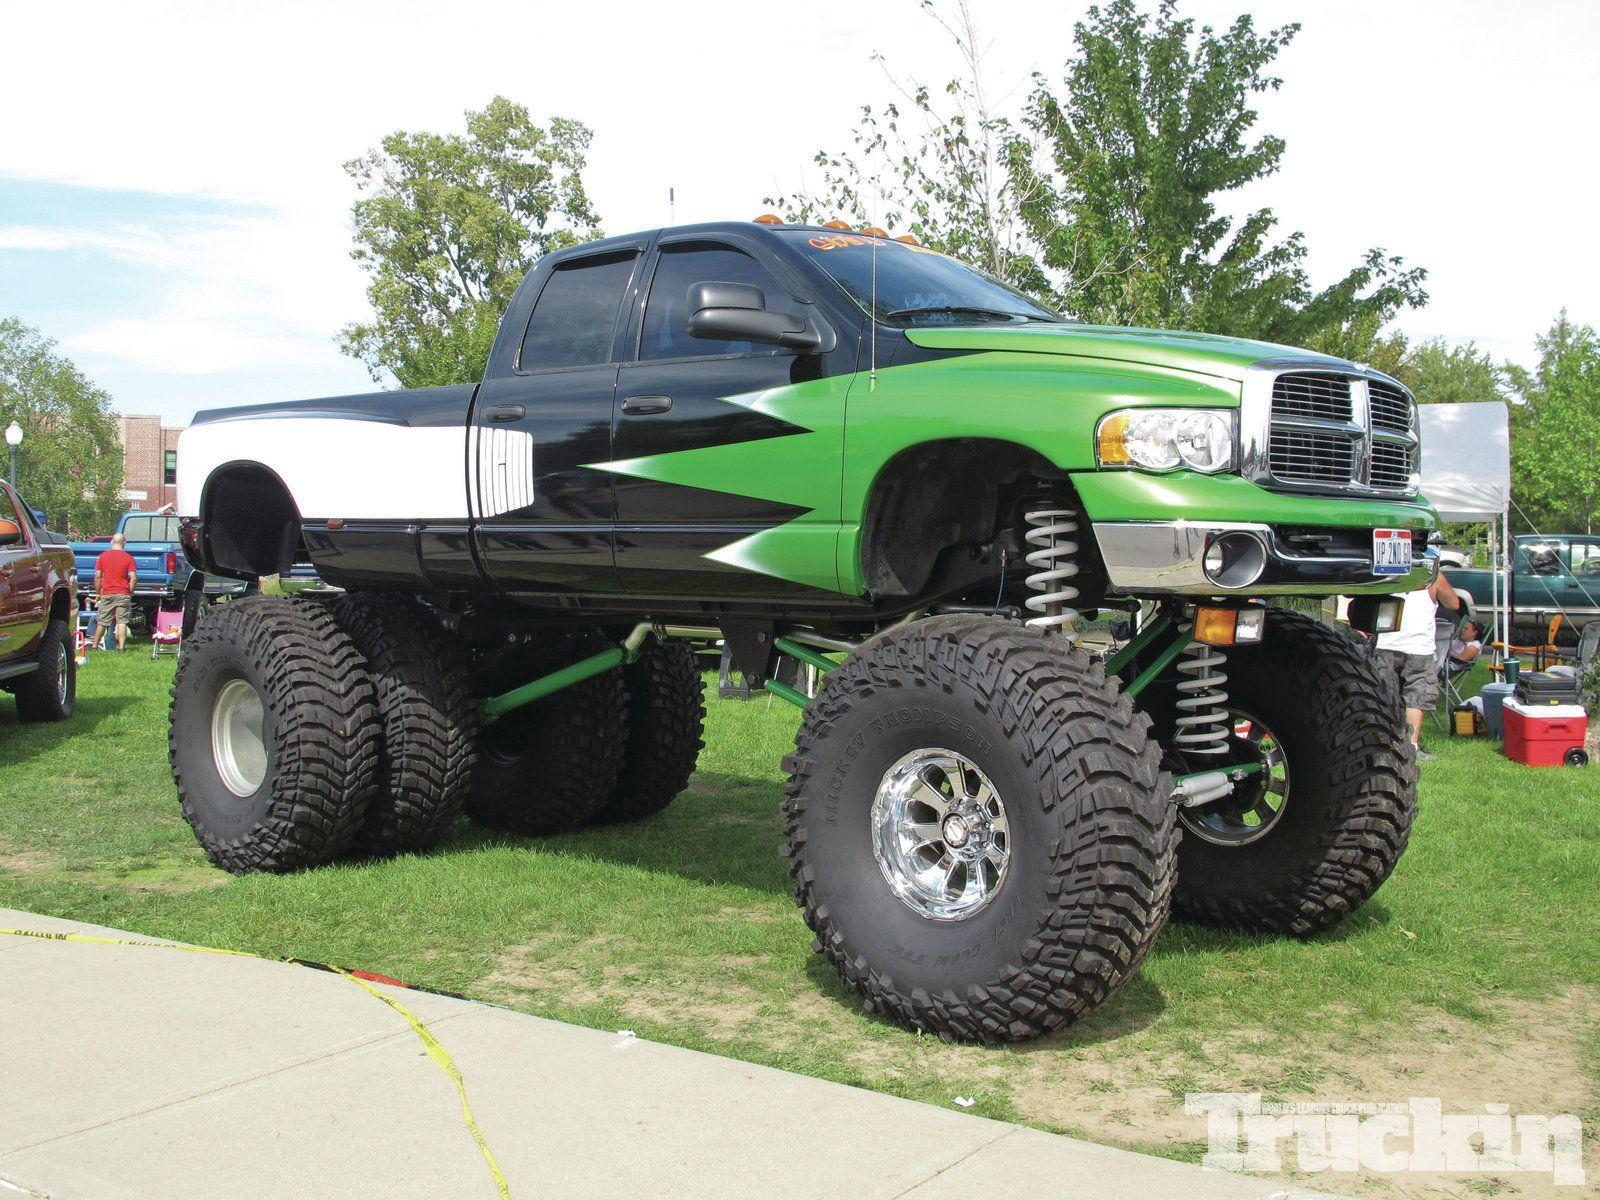 Gmc Chev Fanatics Gmcguys On Twitter Trucks Lifted Trucks Monster Trucks